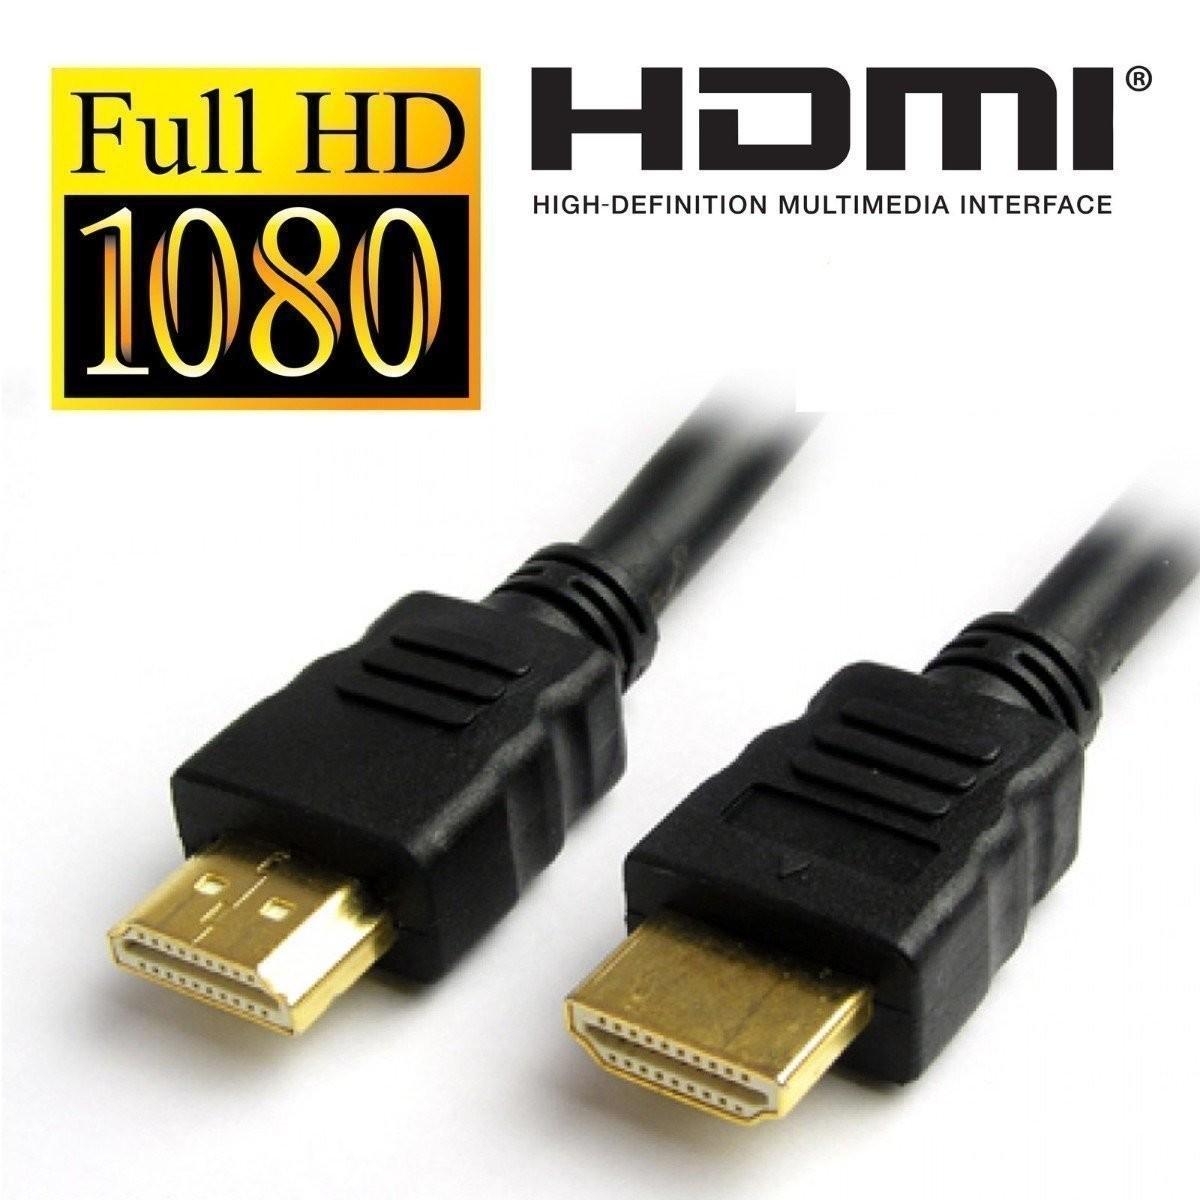 Haze 3 Meter HDMI Cable, PVC, Black